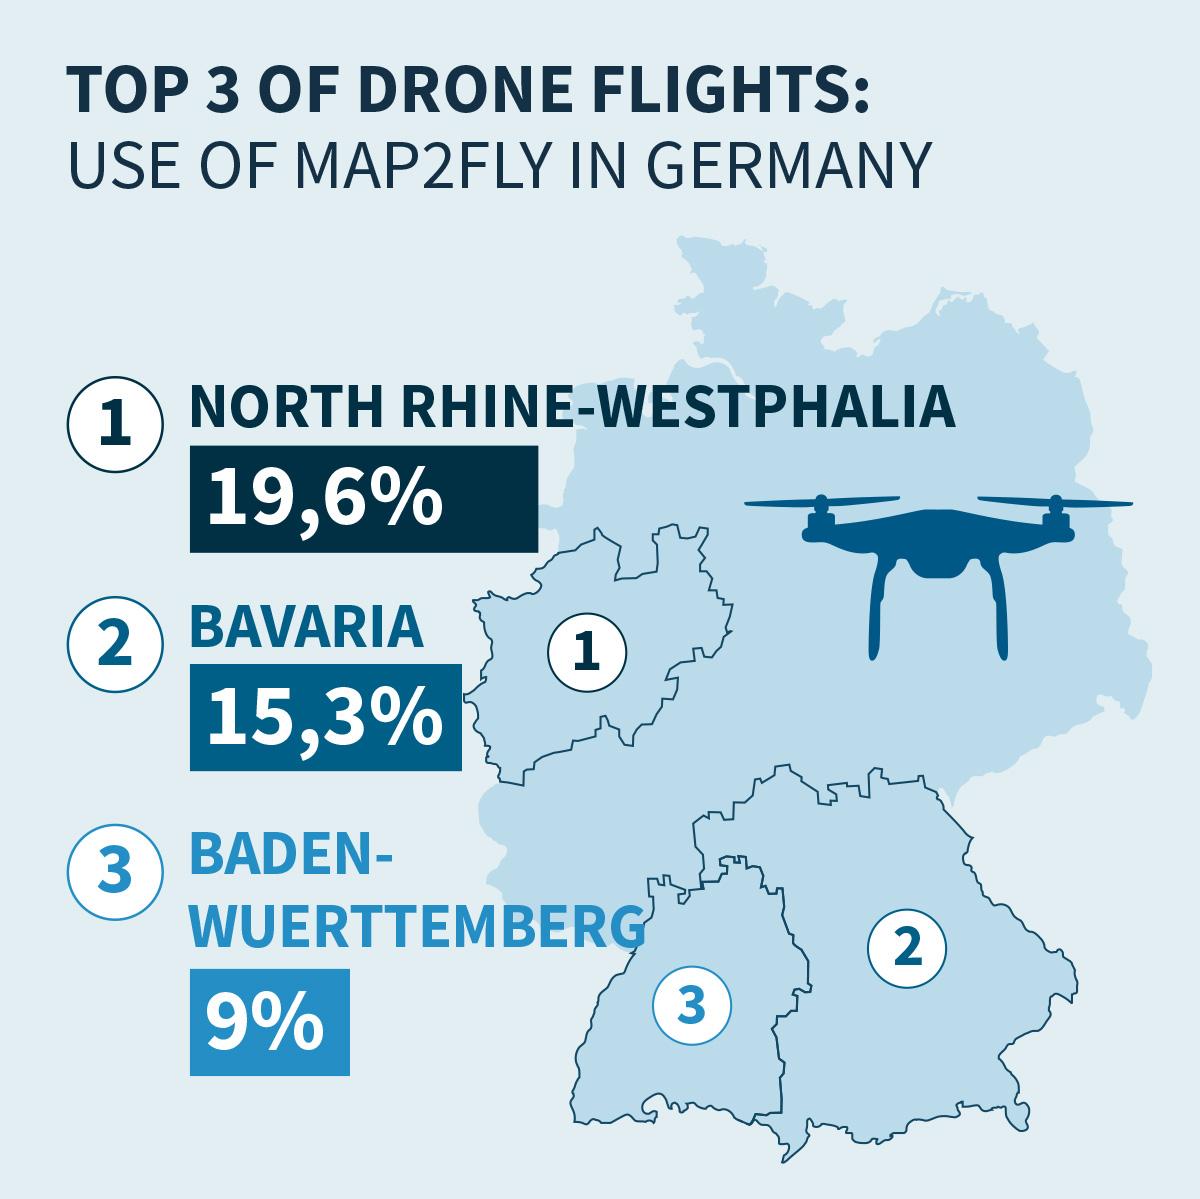 Drones flights in Germany